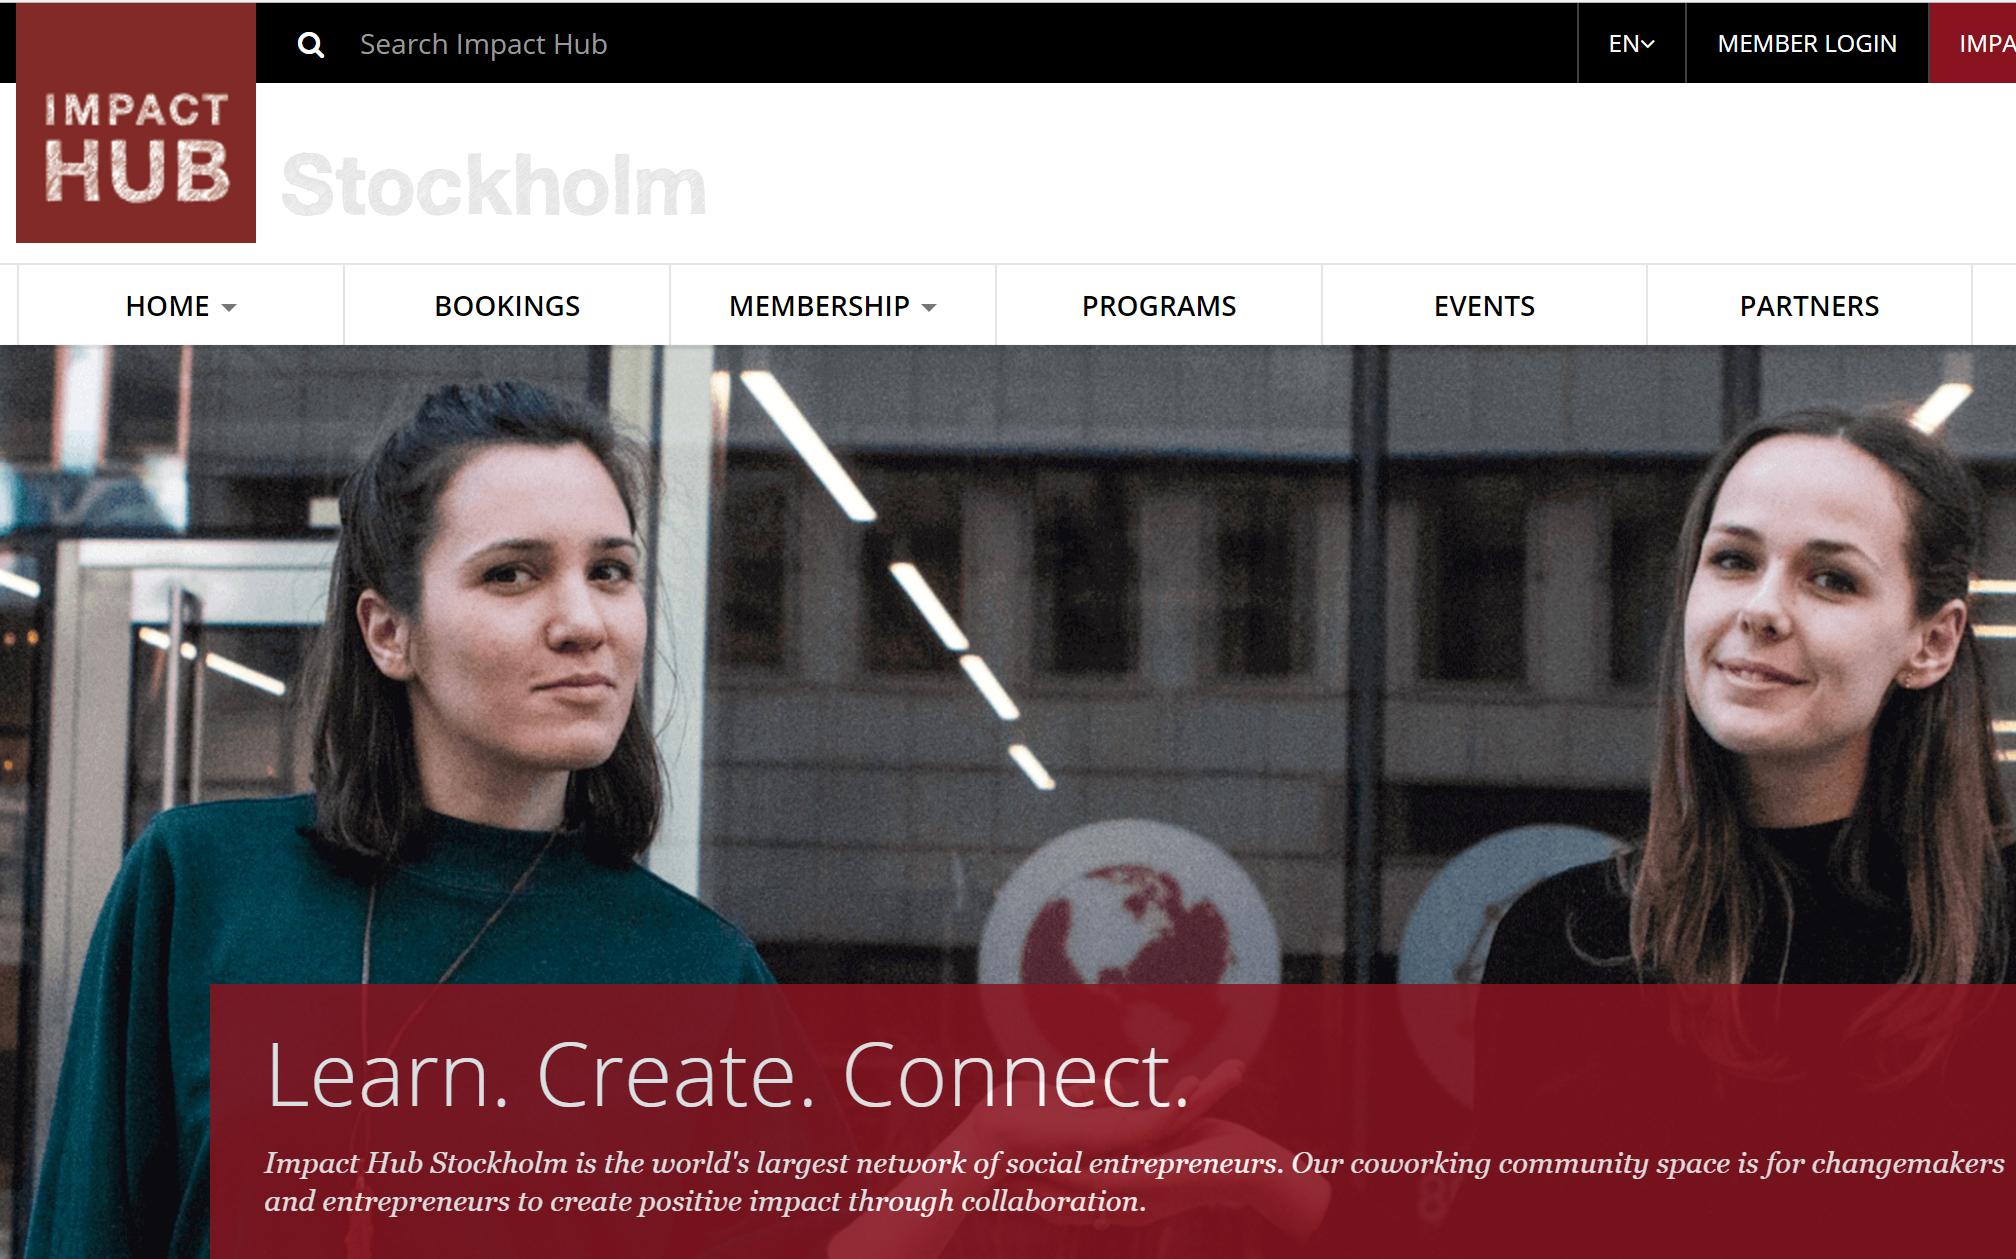 stockholm-impact-hub.png